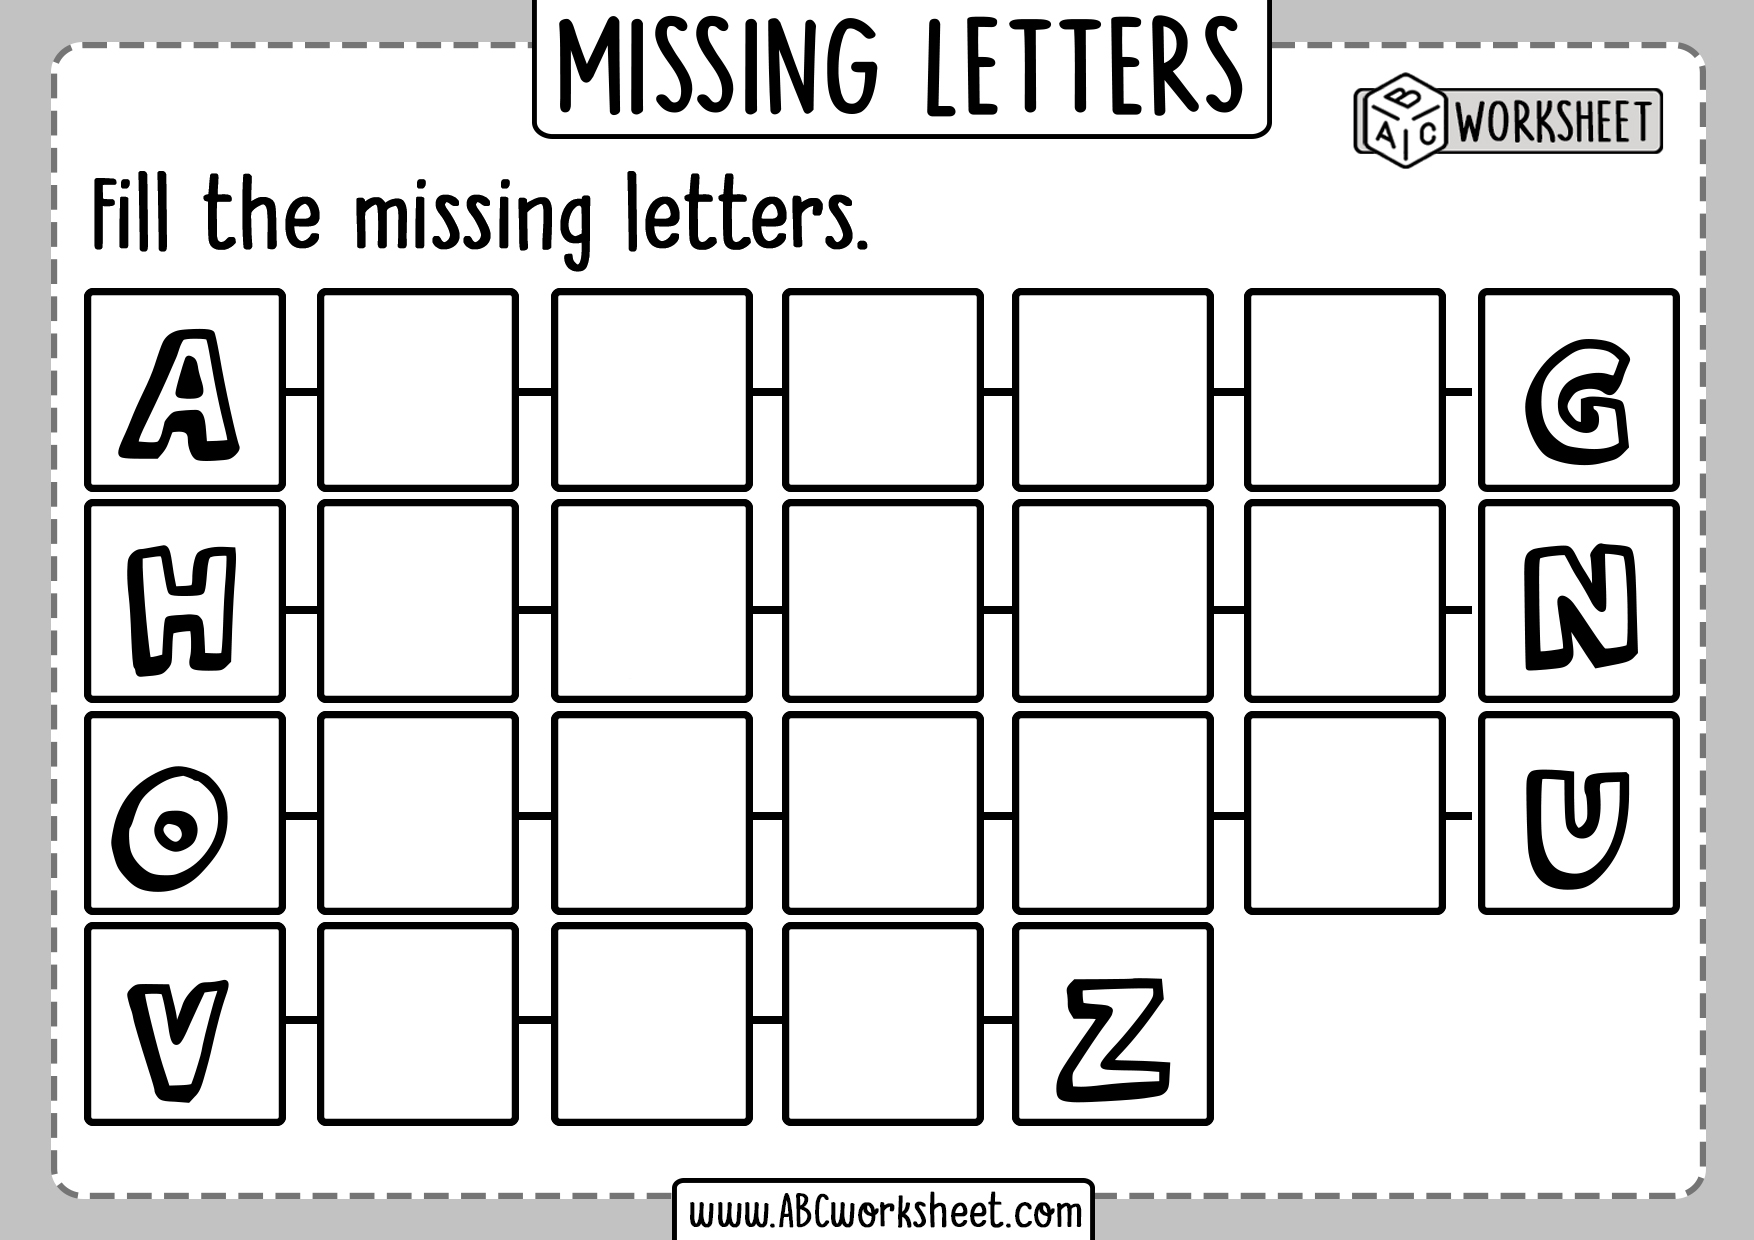 Missing Letters Worksheet For Kids